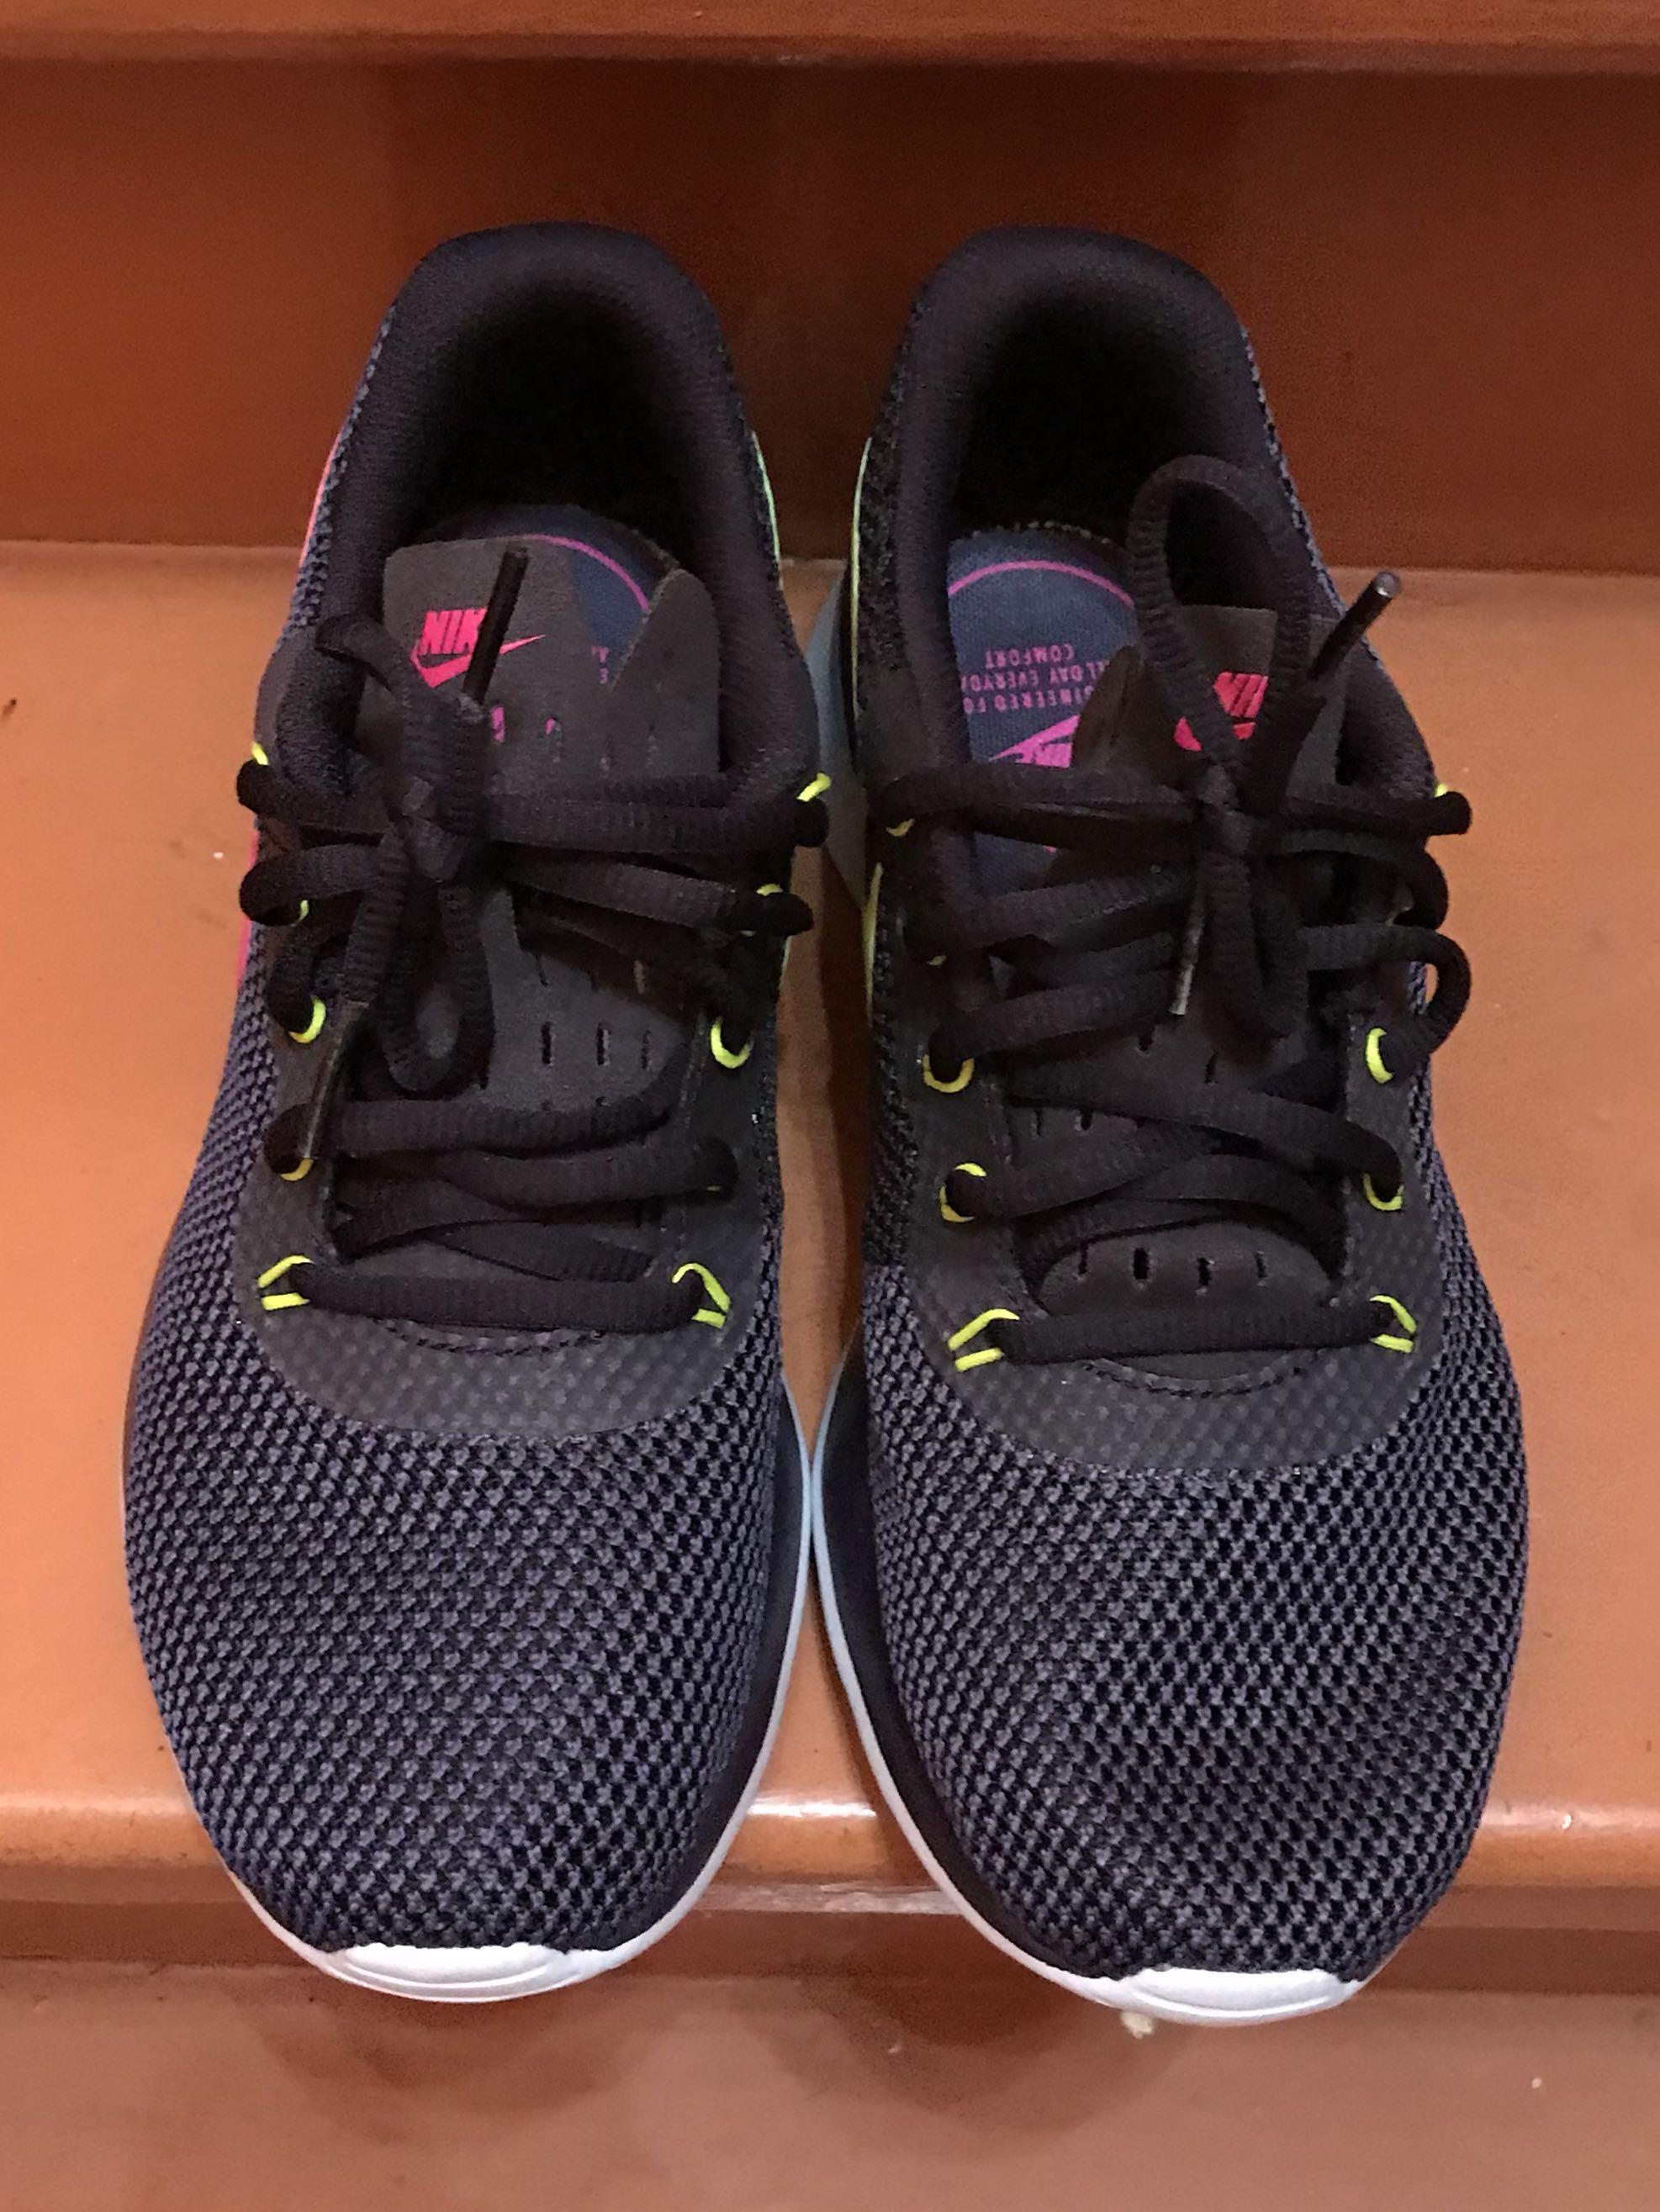 Nike Tanjun Racer Size 6.5 US